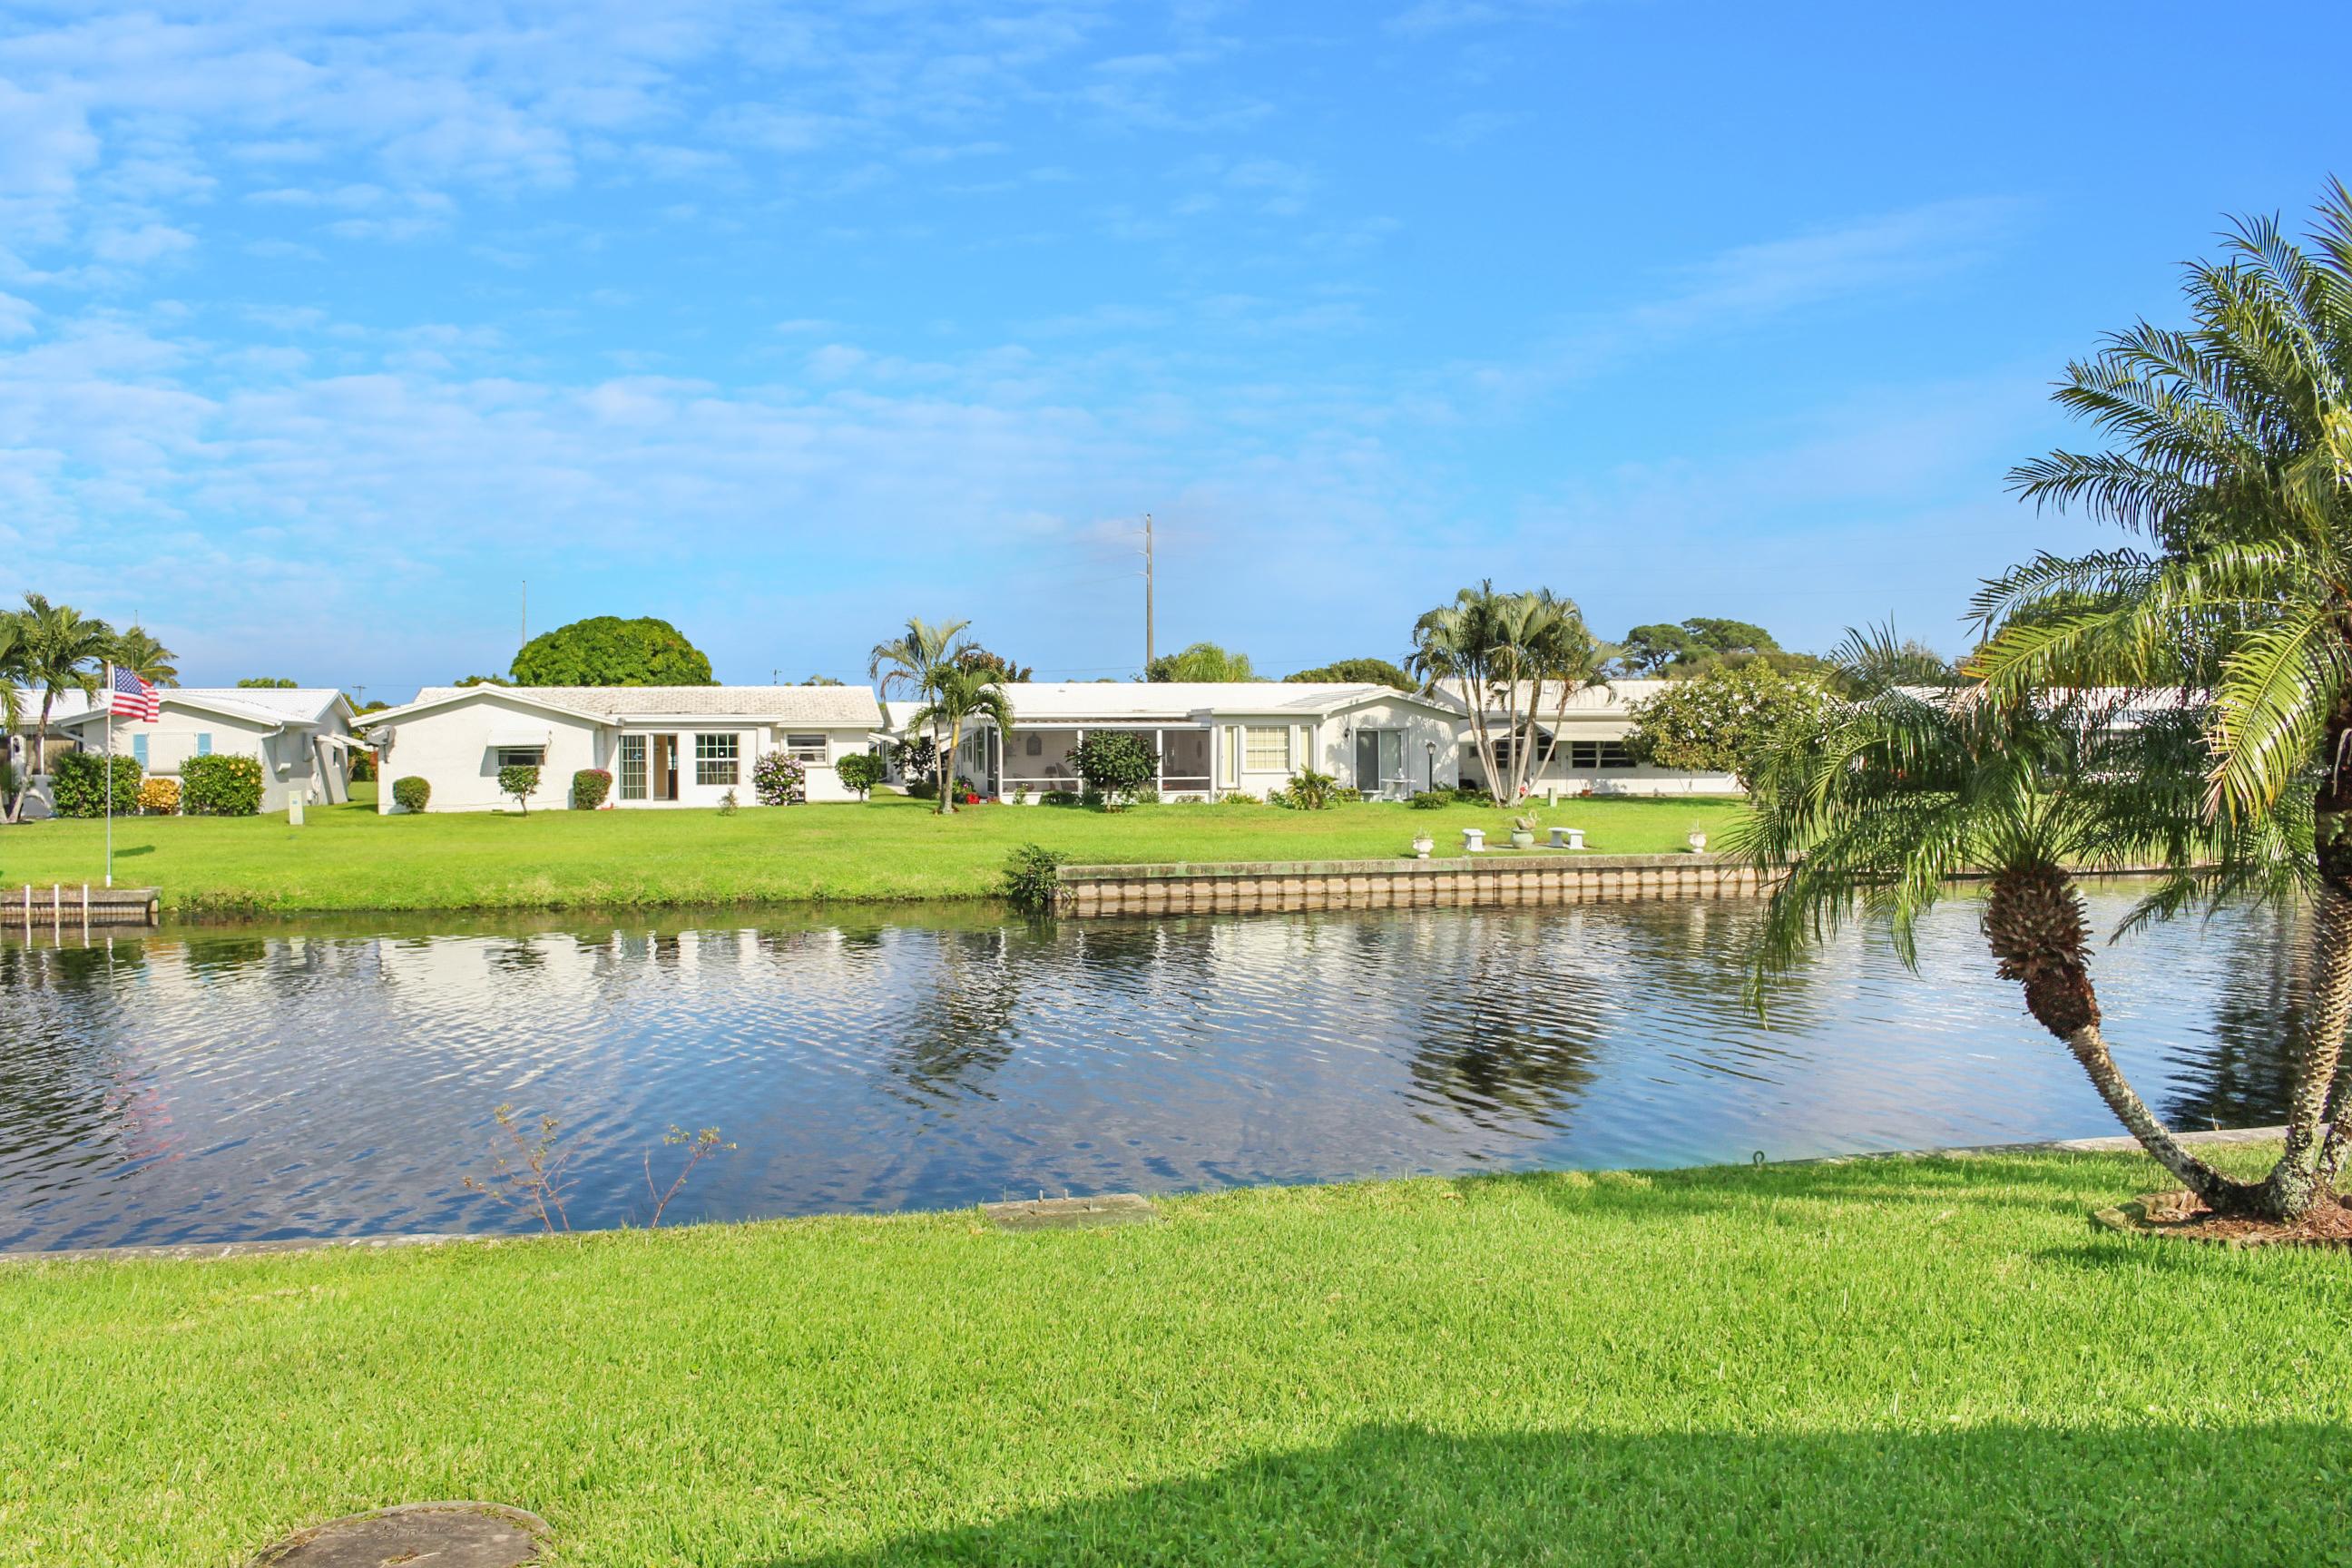 Palm Beach Leisureville Community